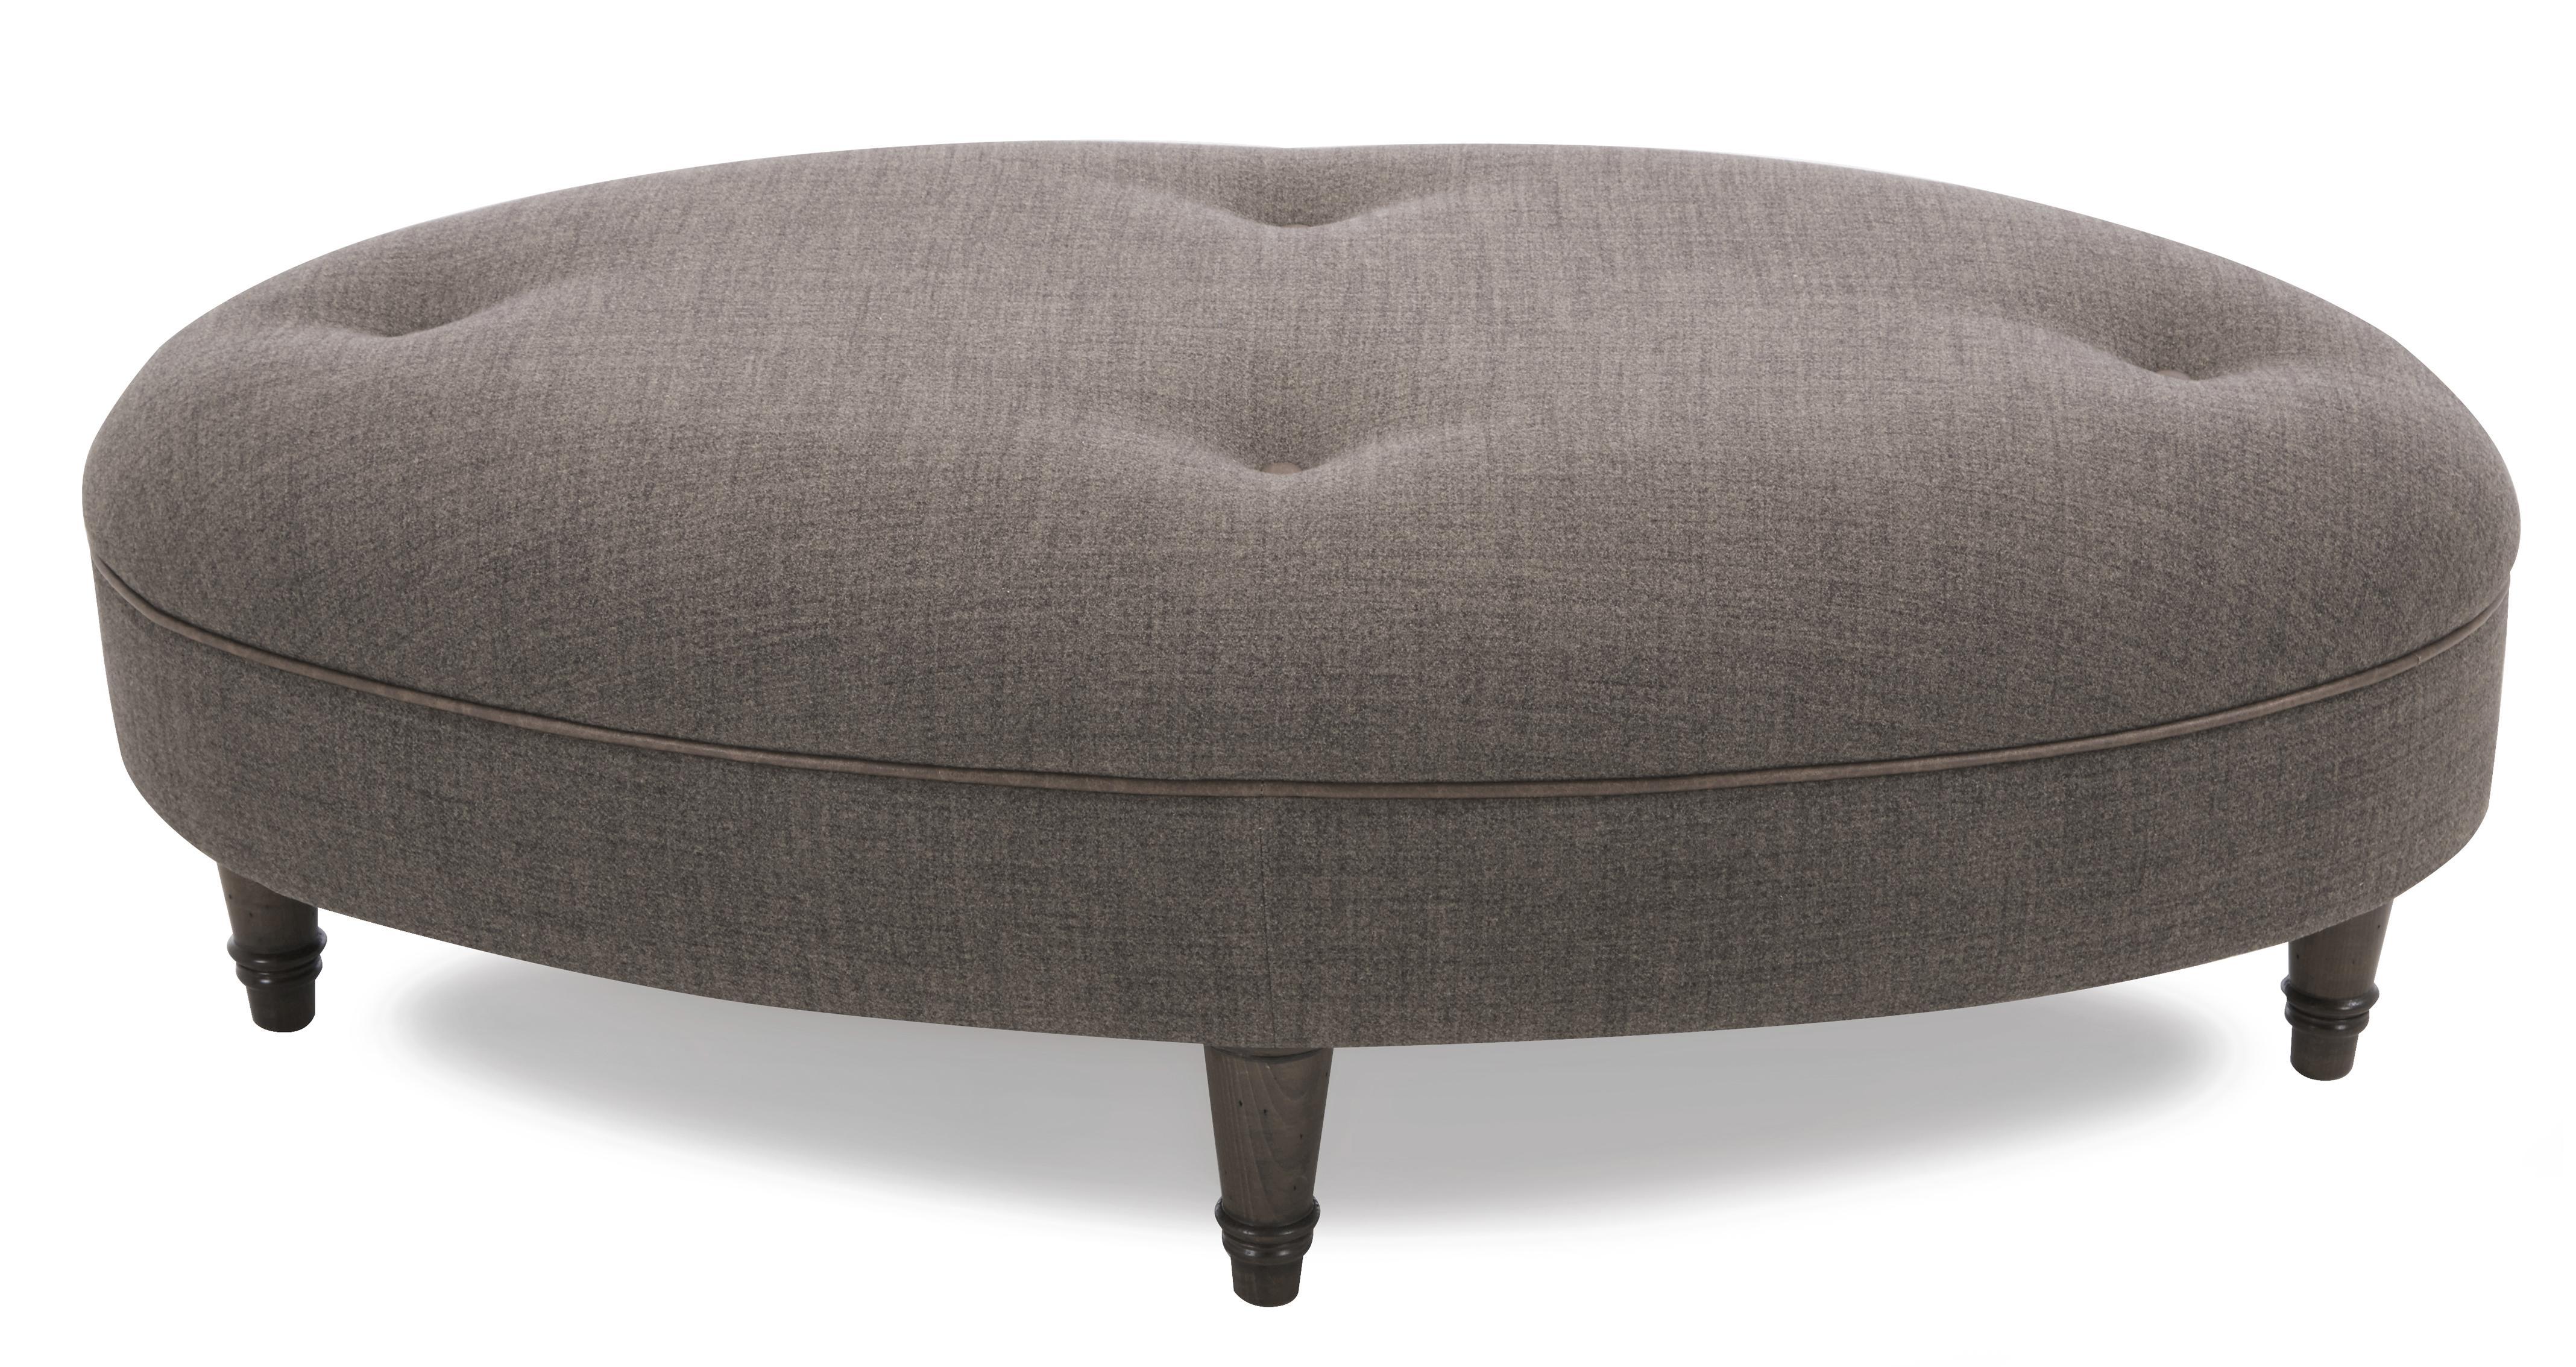 dfs moray sofa reviews olivia bed review plain oval footstool ireland